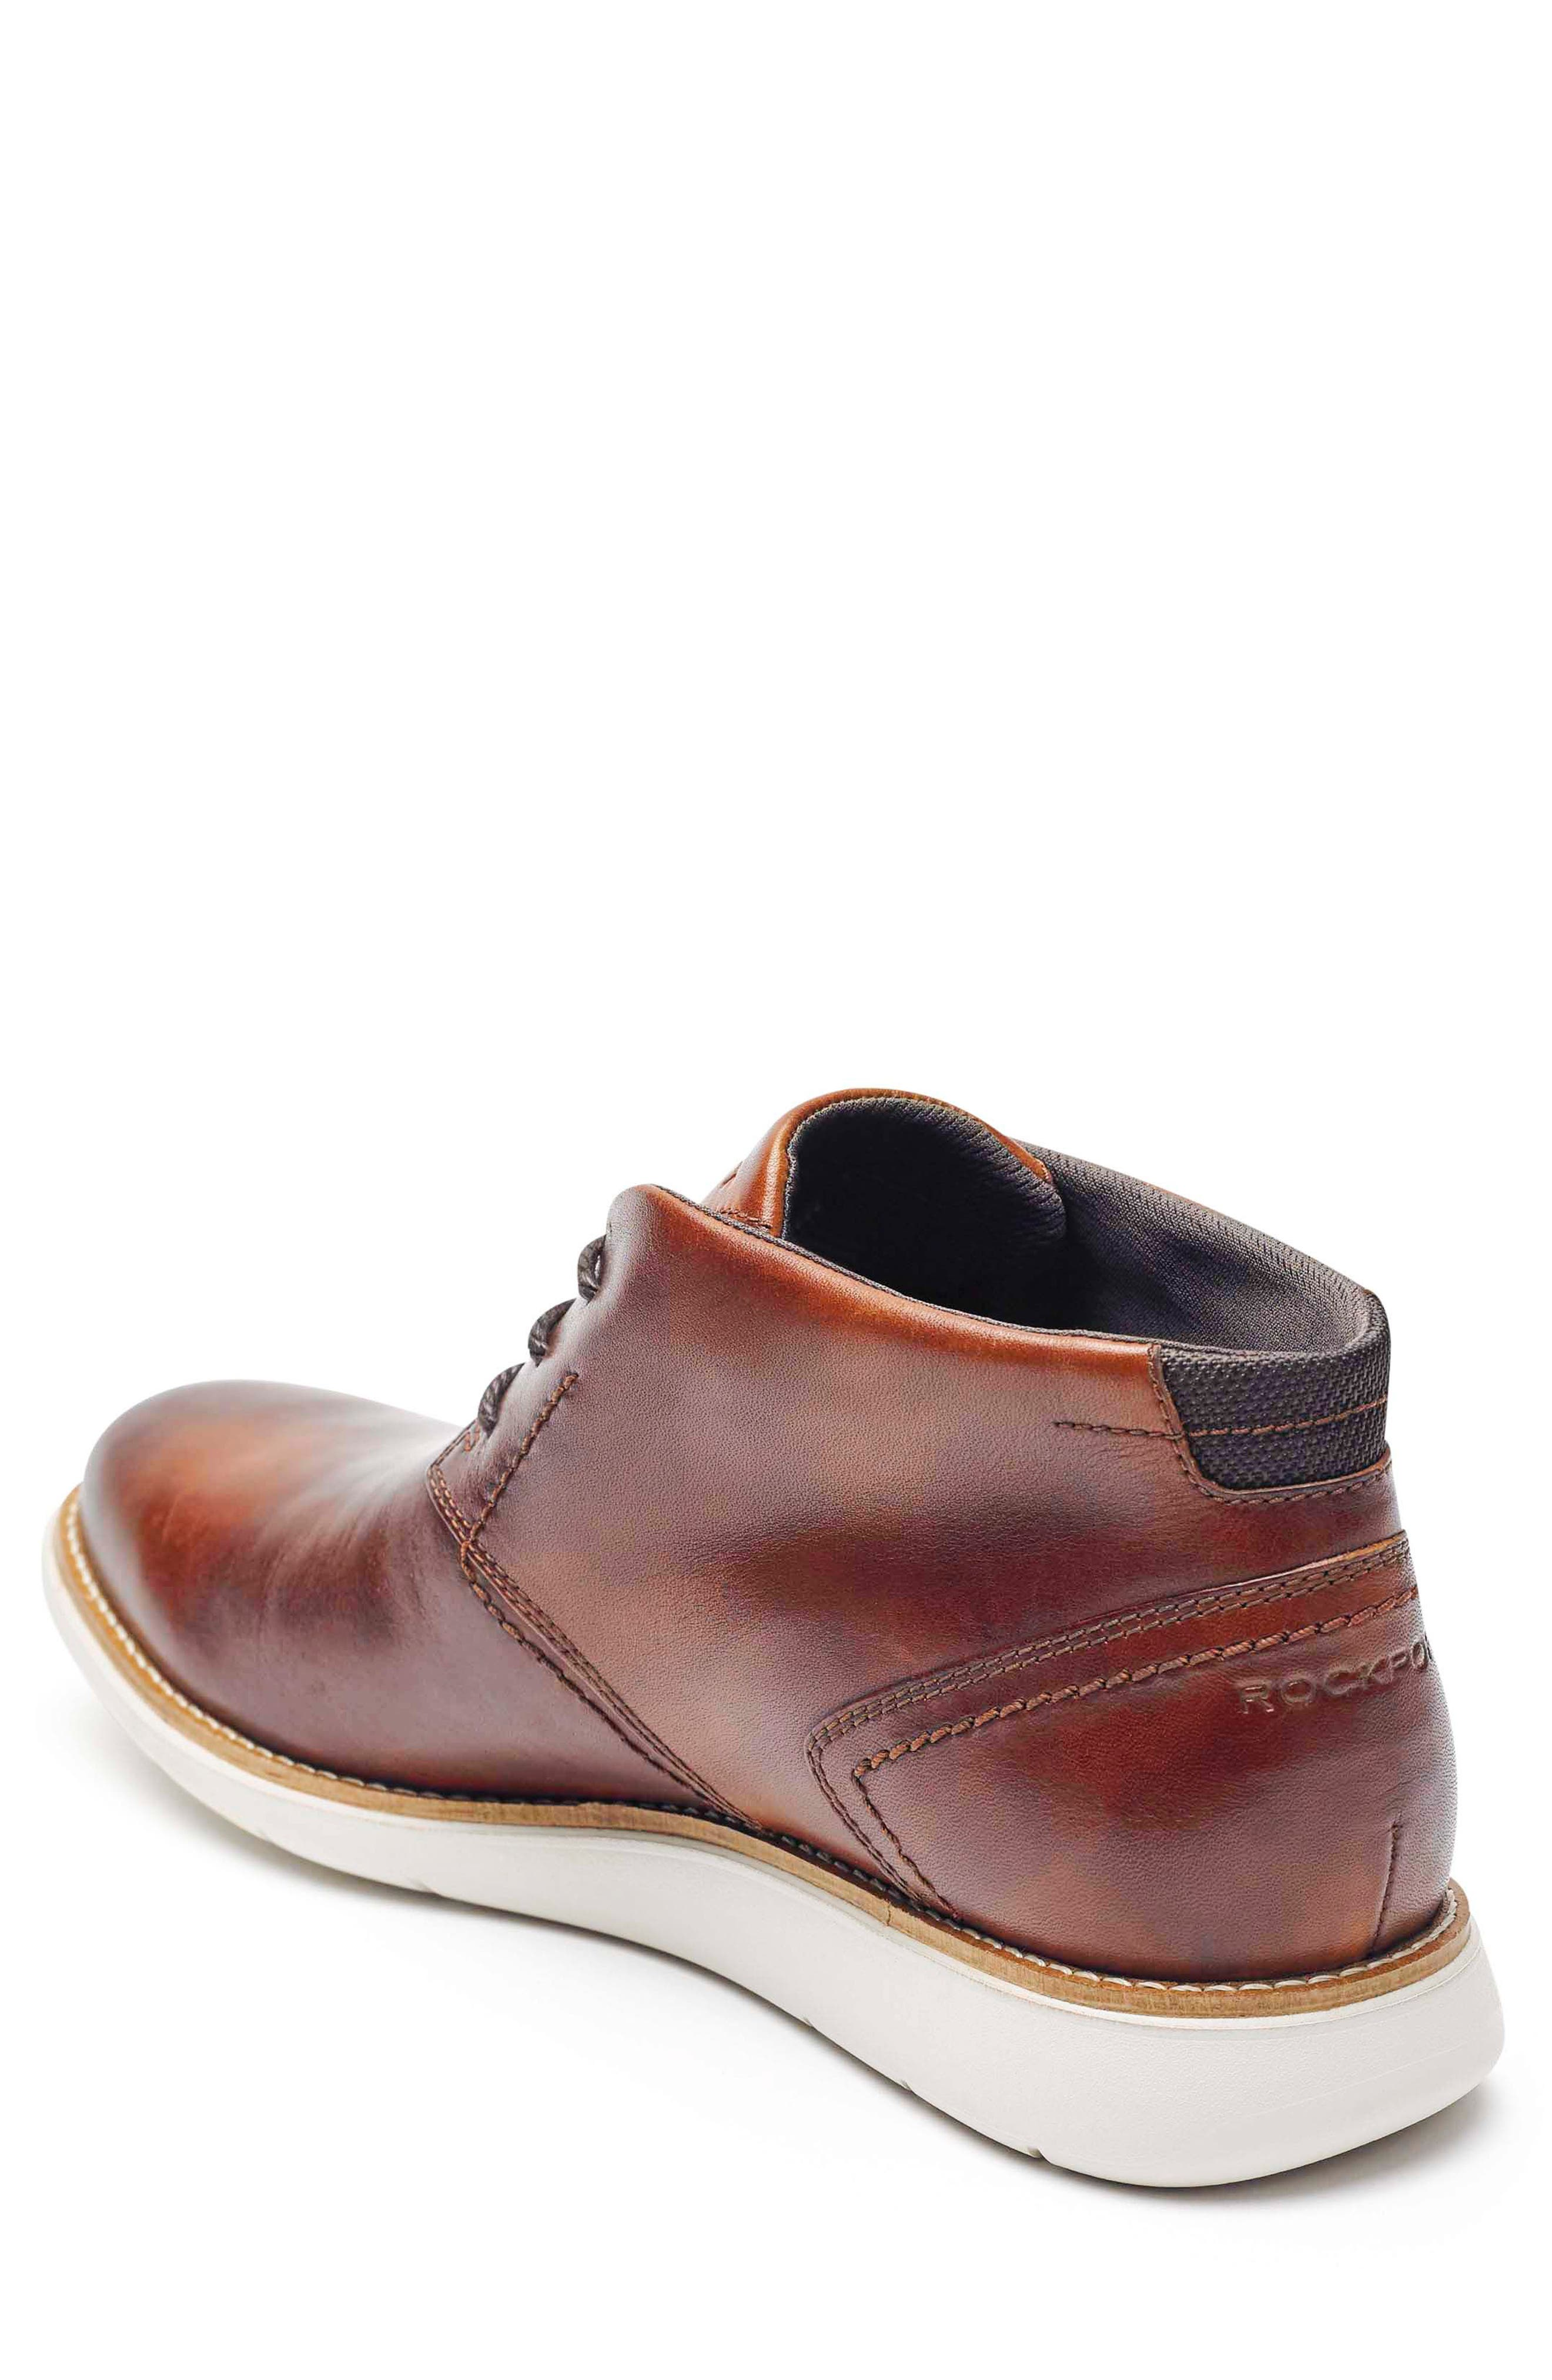 Total Motion Sport Dress Chukka Boot,                             Alternate thumbnail 2, color,                             Tan Leather